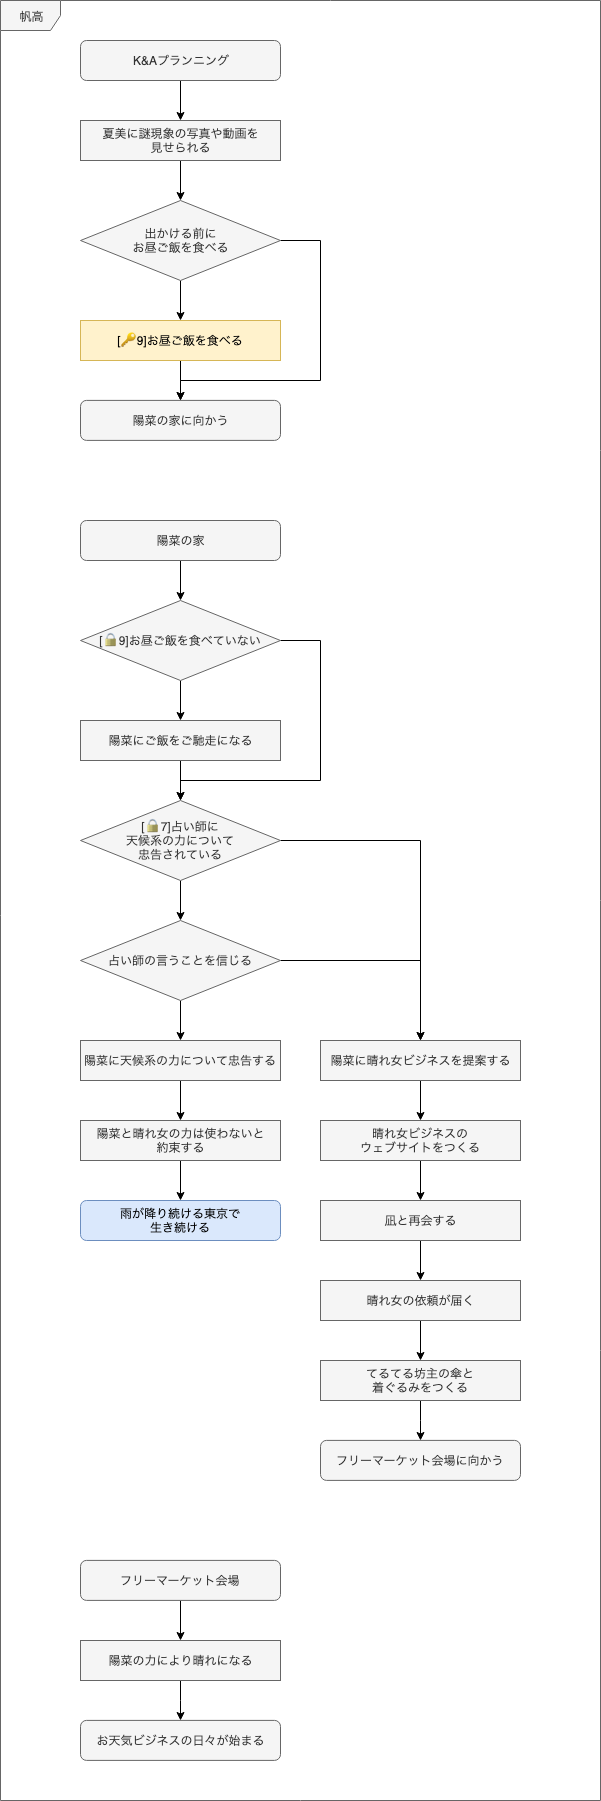 https://cdn-ak.f.st-hatena.com/images/fotolife/m/munieru_jp/20190913/20190913111729_original.png